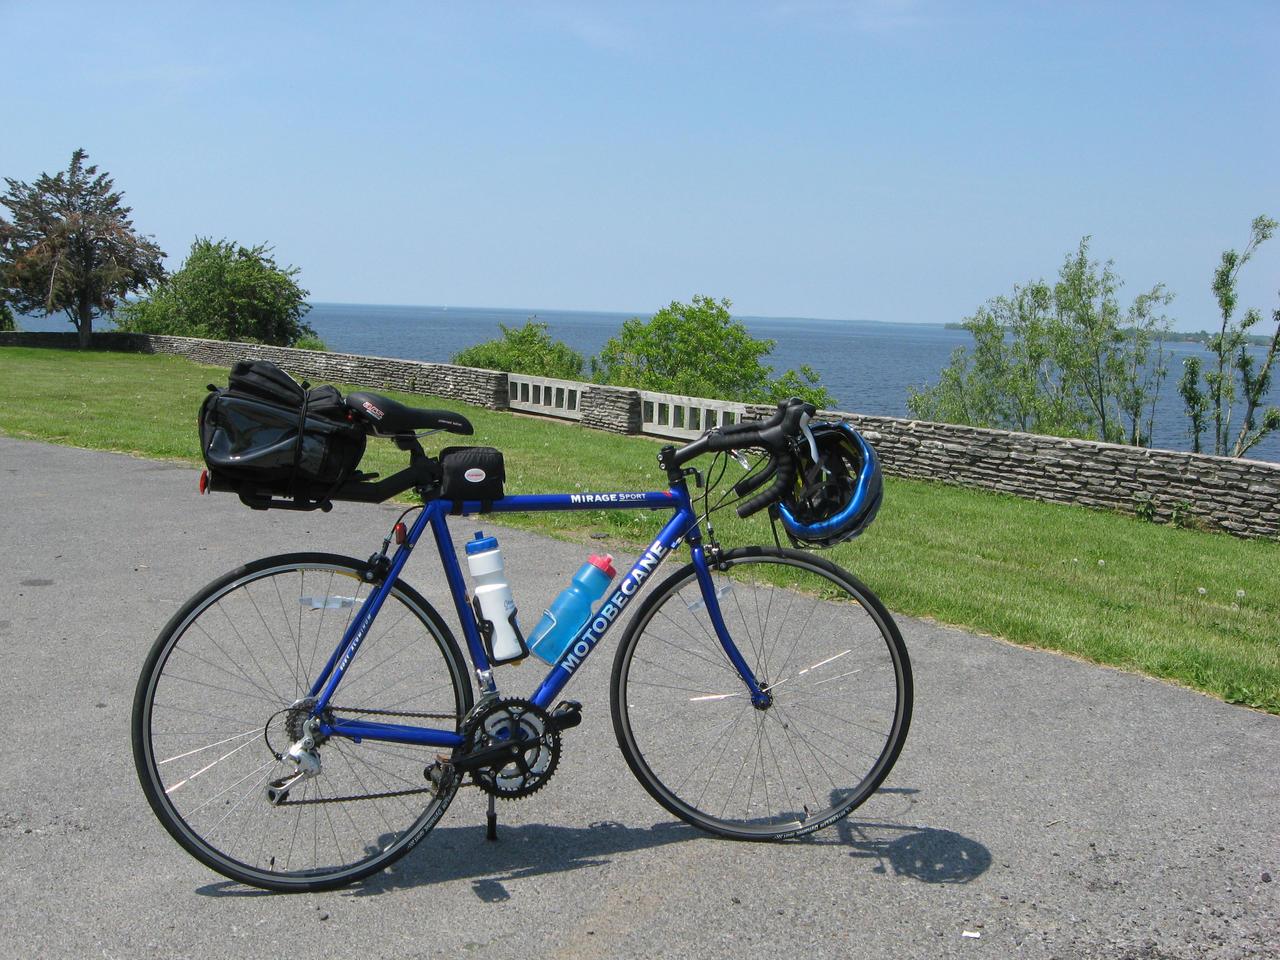 Motobecane Bike At Sacketts Harbor (1) by Lectrichead